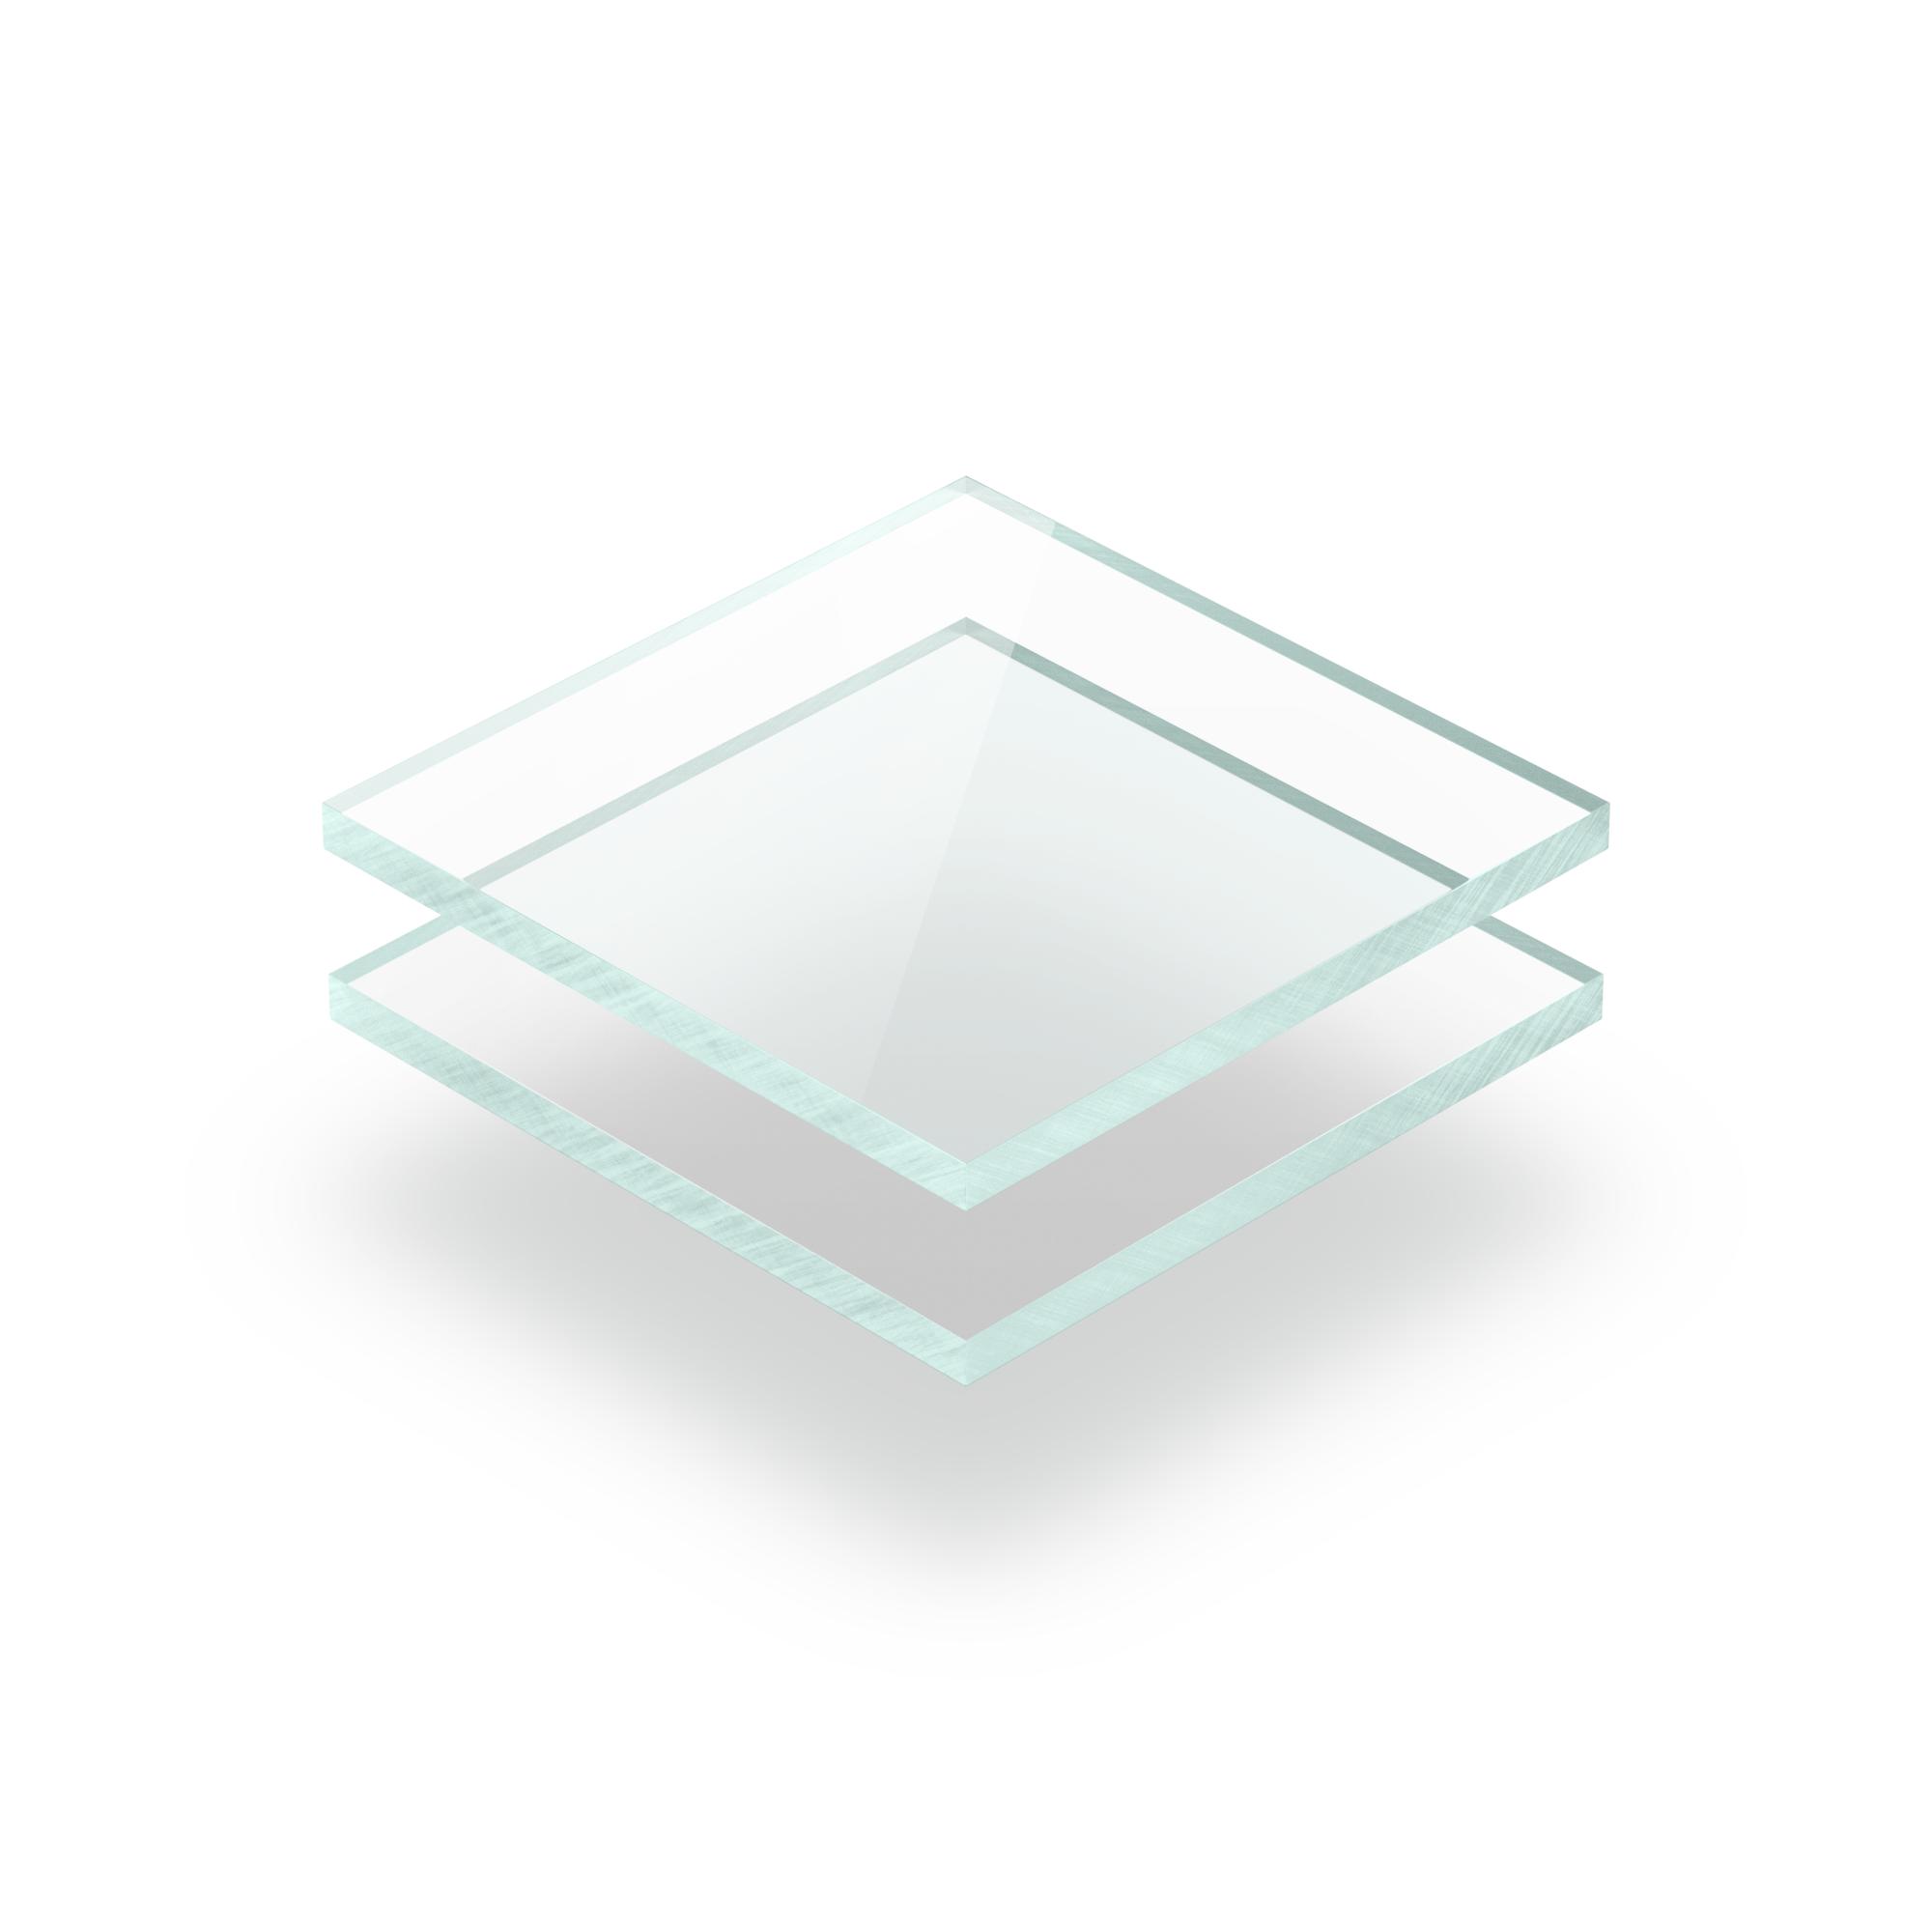 Tinted Acrylic Sheet Glass Look 3 Mm Plasticsheetsshop Co Uk